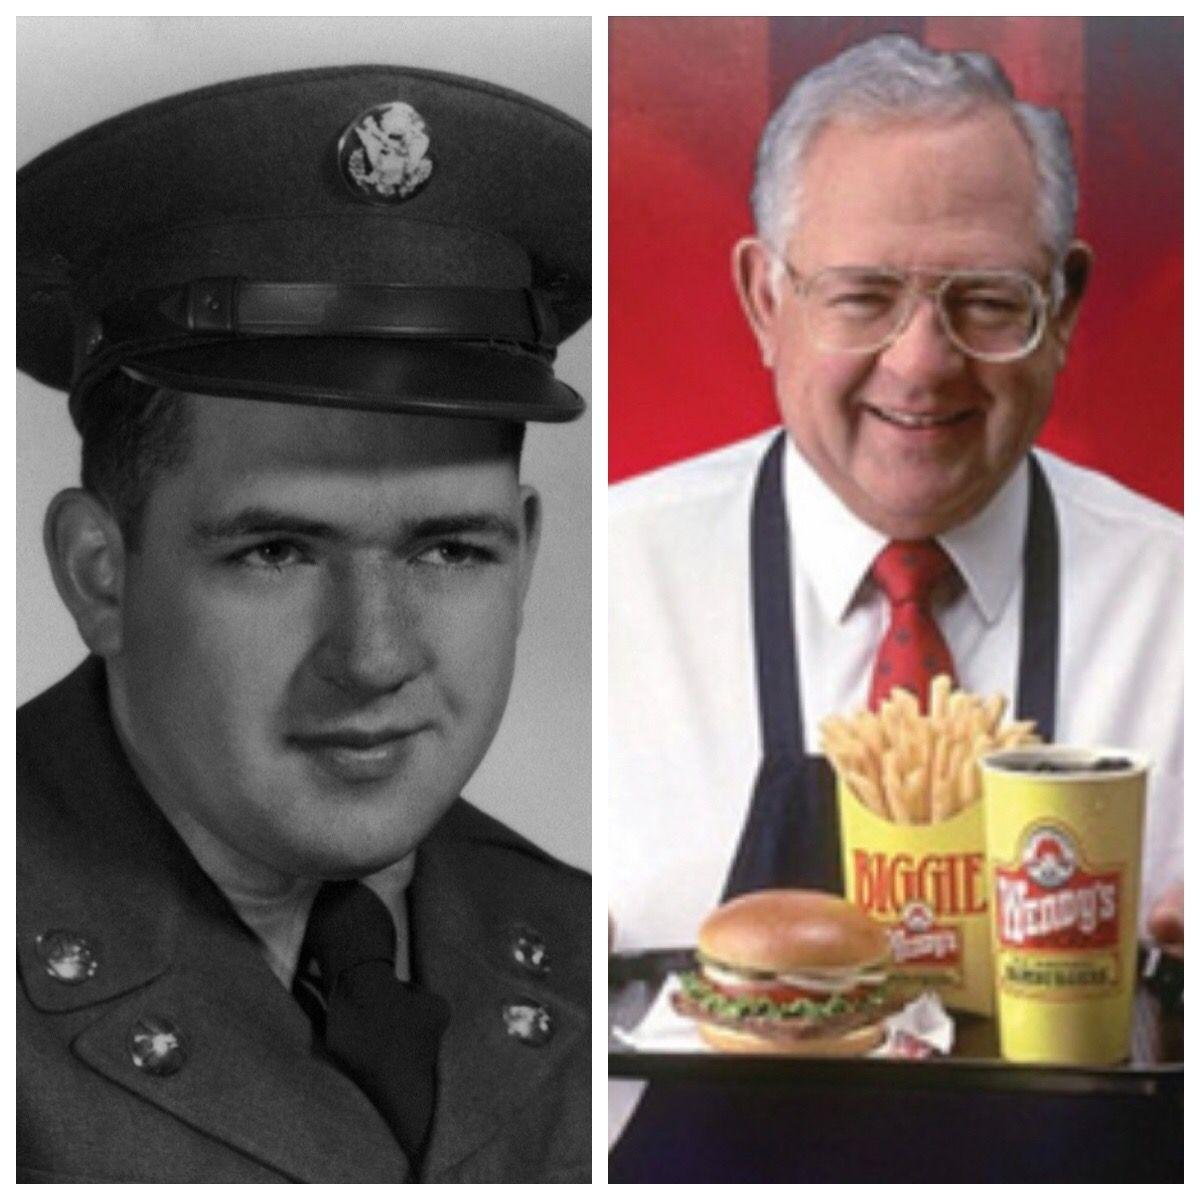 Dave thomasus army19501953 staff sergeanthe